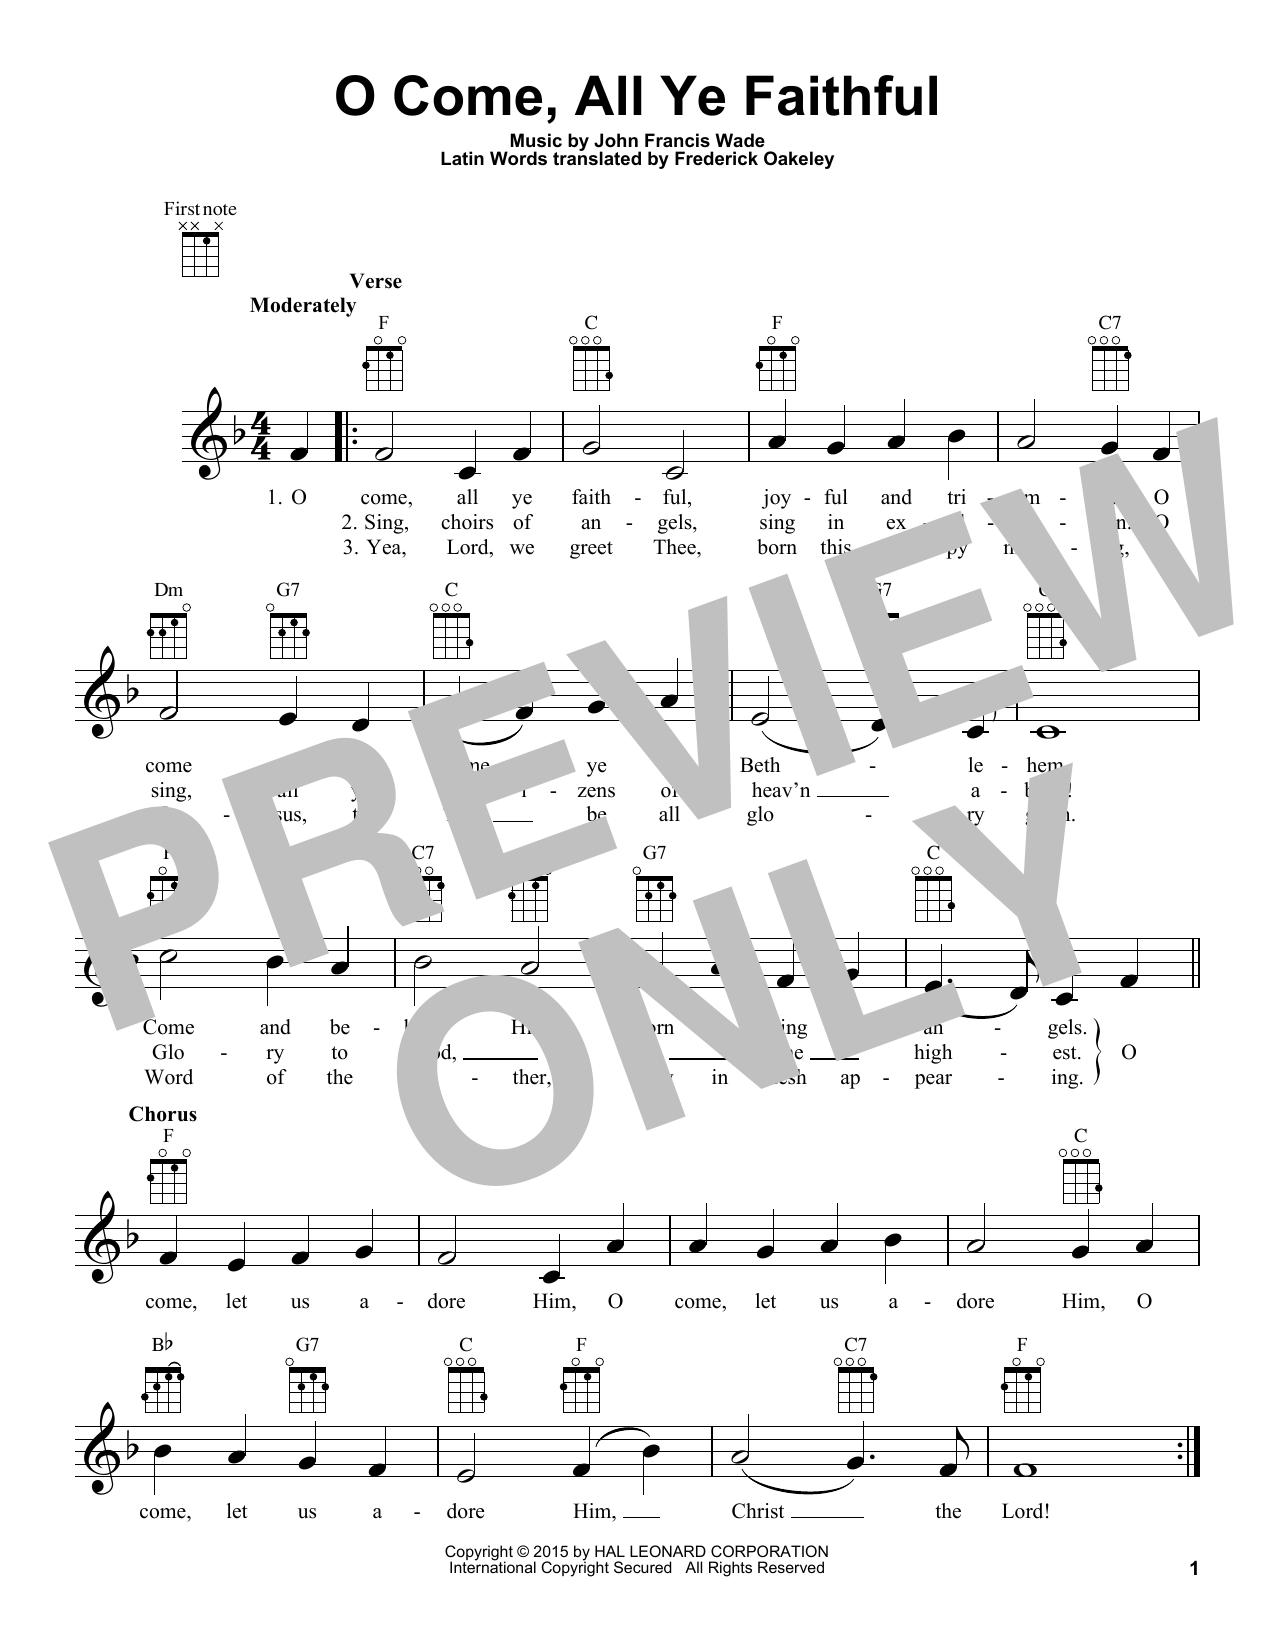 Sheet Music Digital Files To Print Licensed John Francis Wade